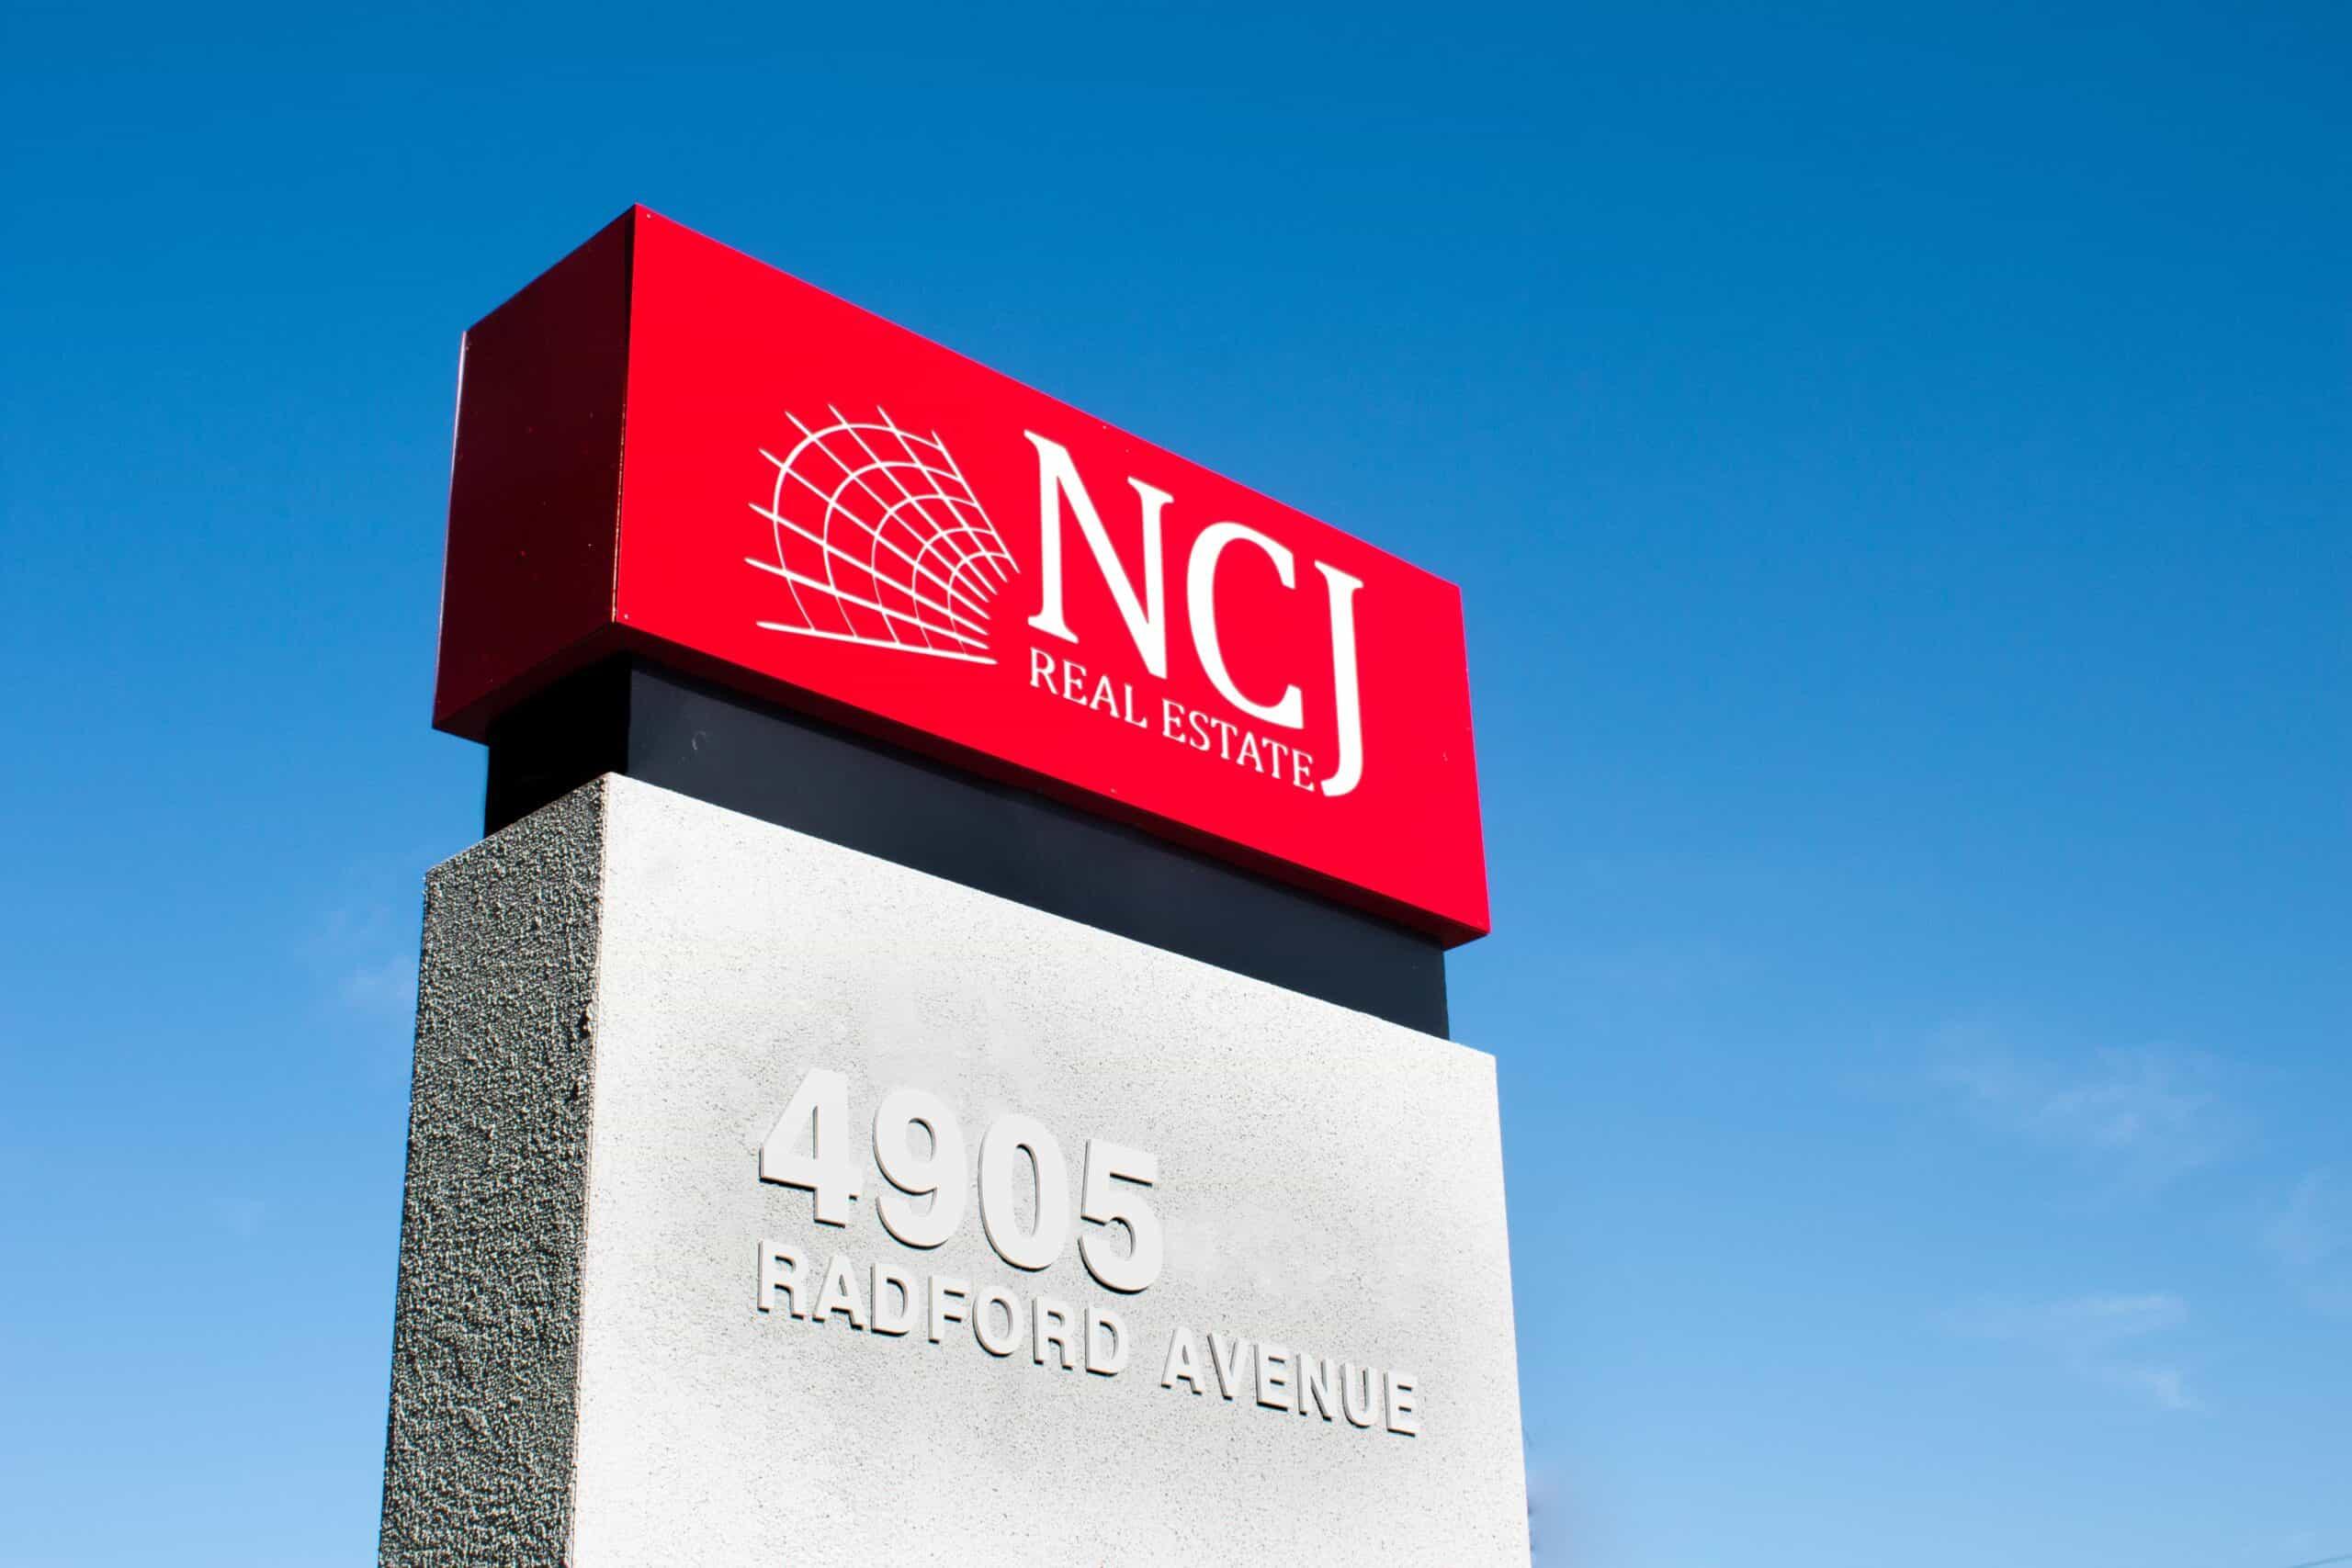 NCJ Sign